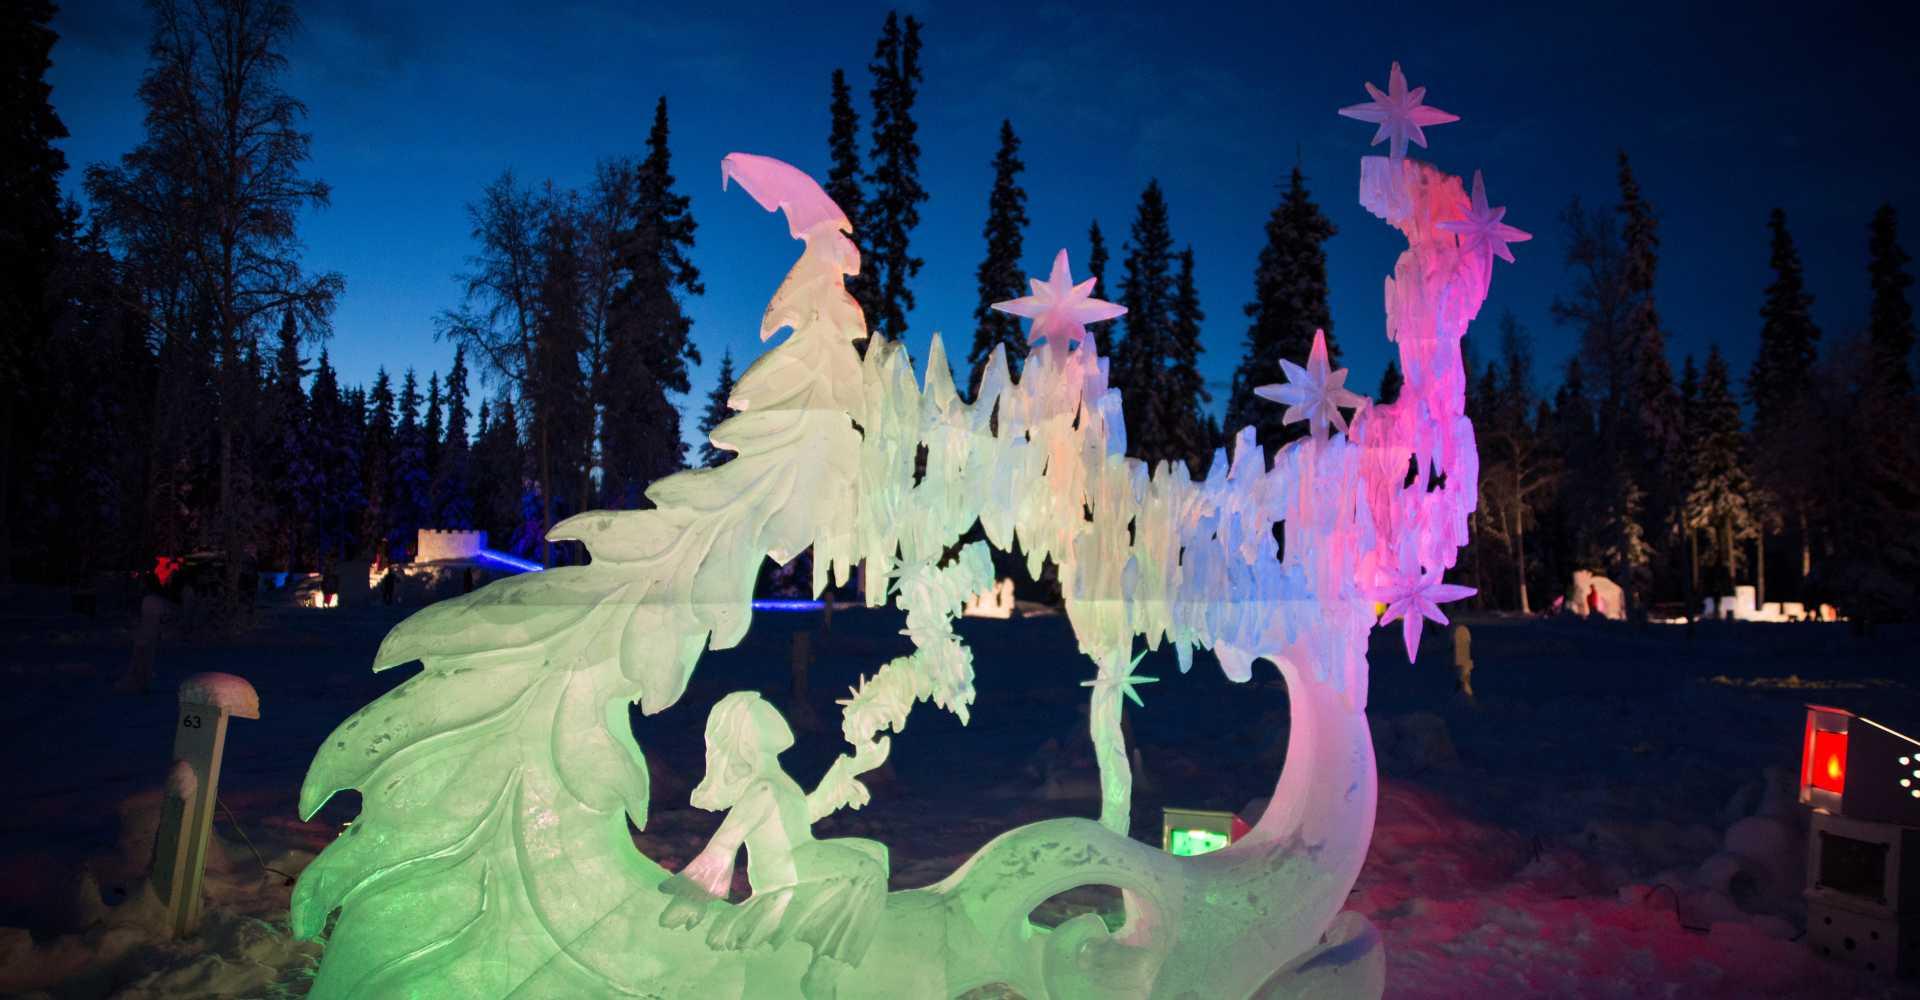 Christmas 2020 Events Fairbanks Ak Events & Entertainment | Explore Fairbanks, Alaska